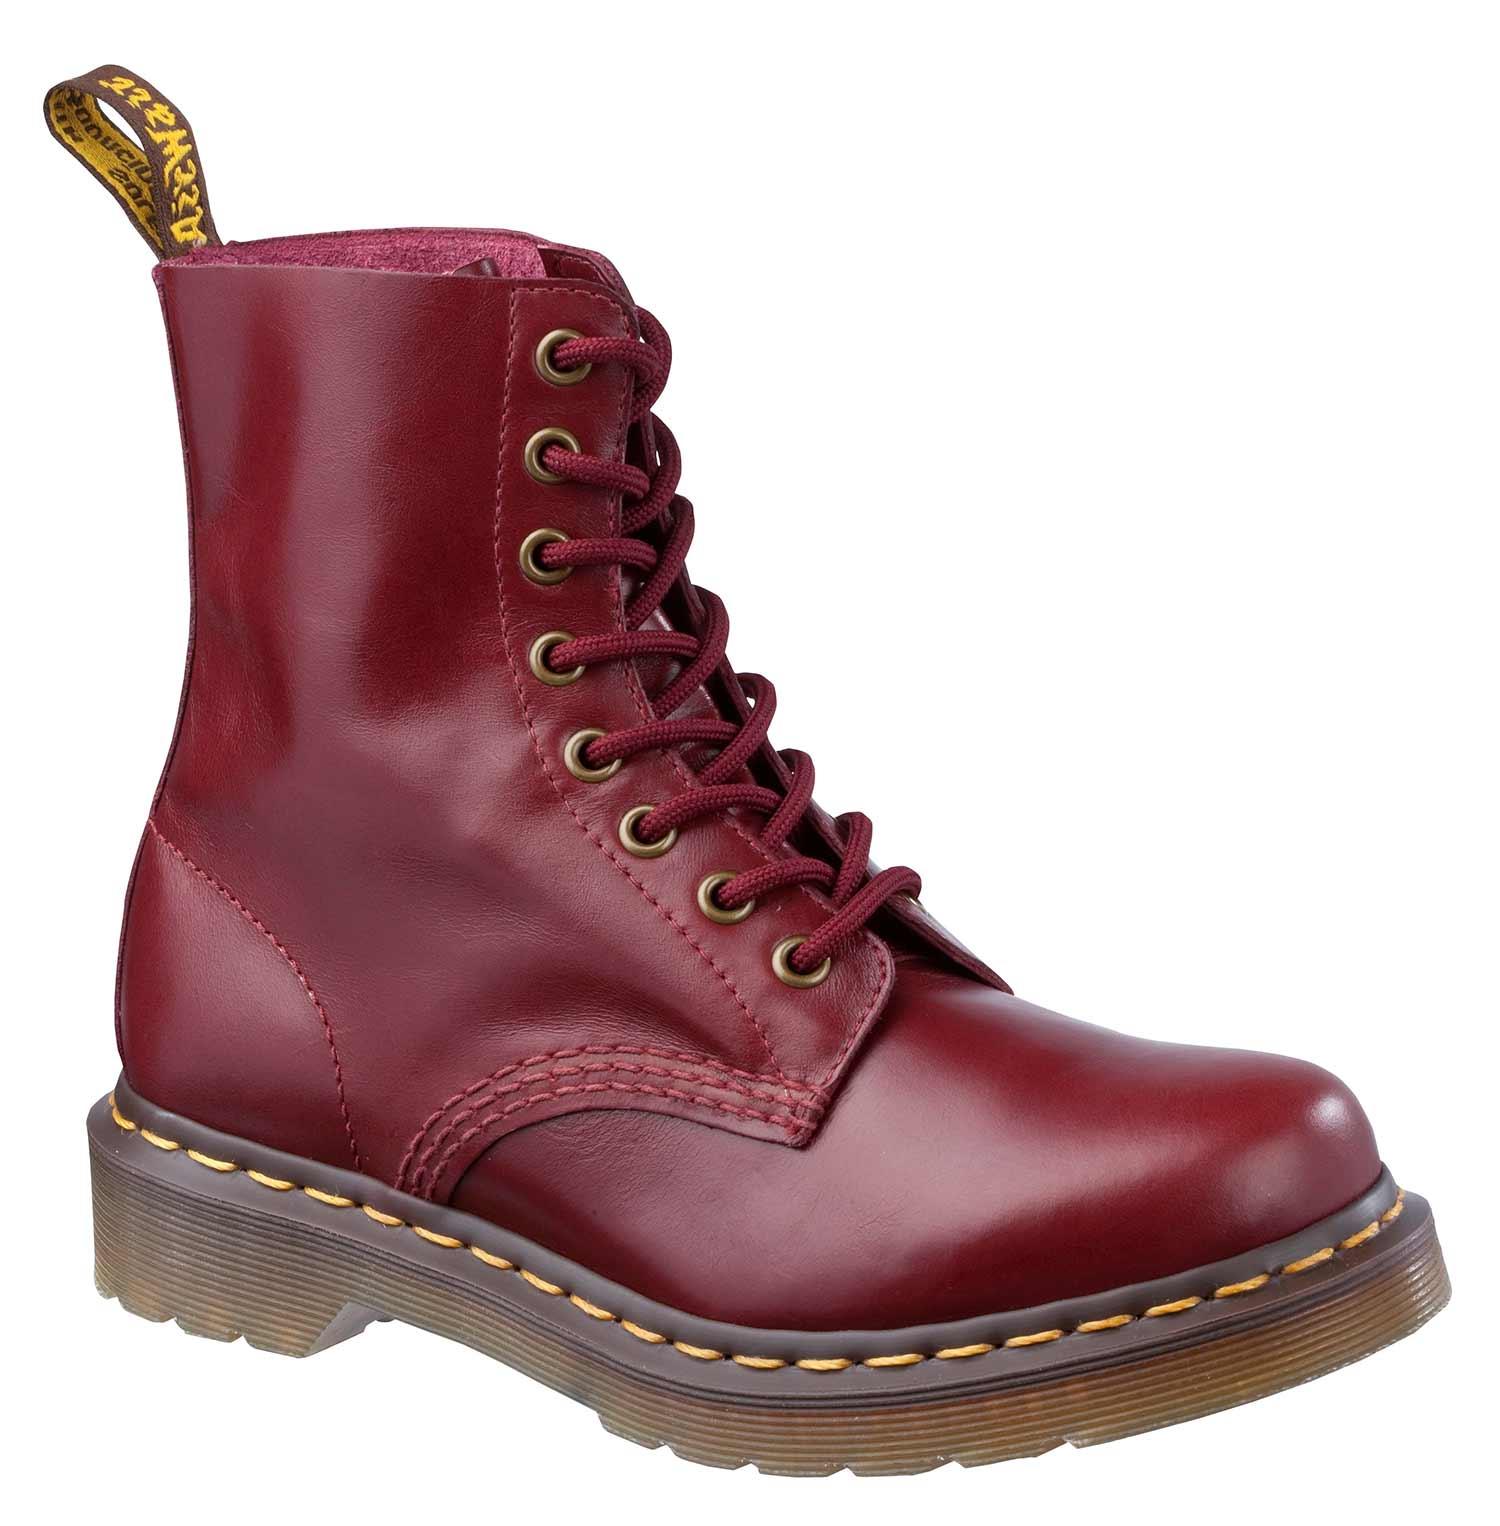 Dr-Martens-Doc-Boots-Stiefel-Smooth-8-Eye-Loch-1460z-Lederstiefel-Neu